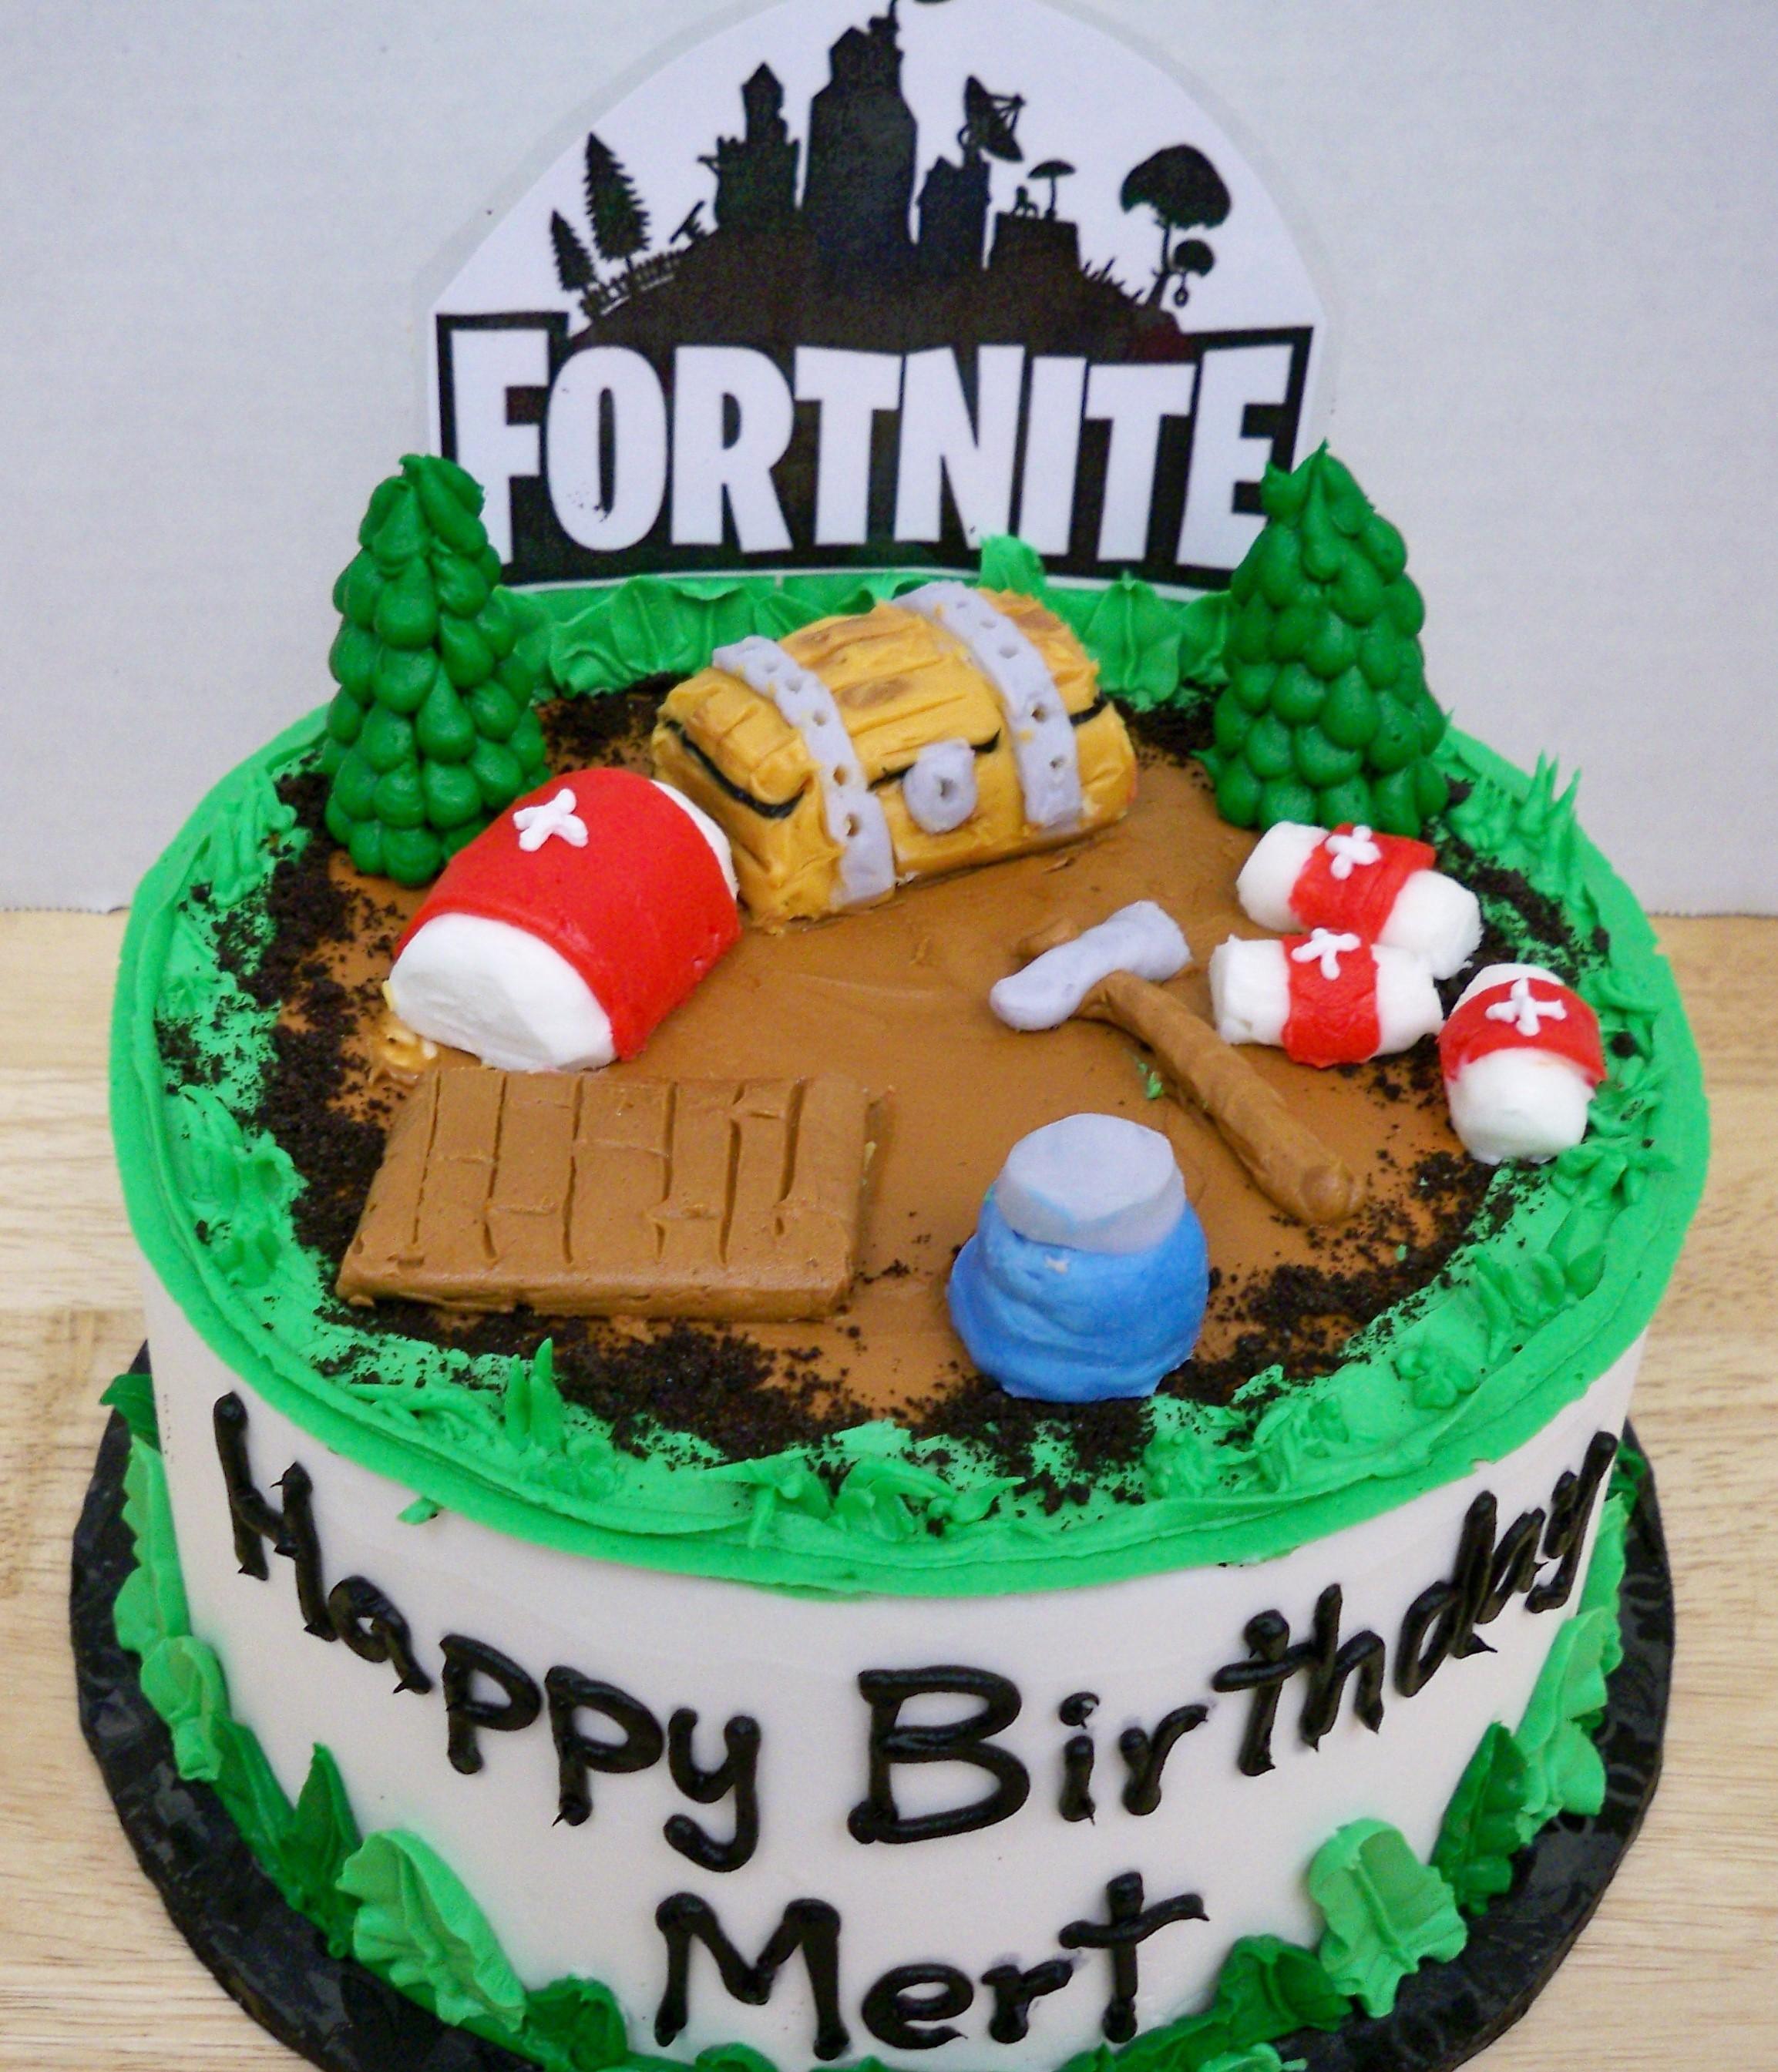 fortnite cake,